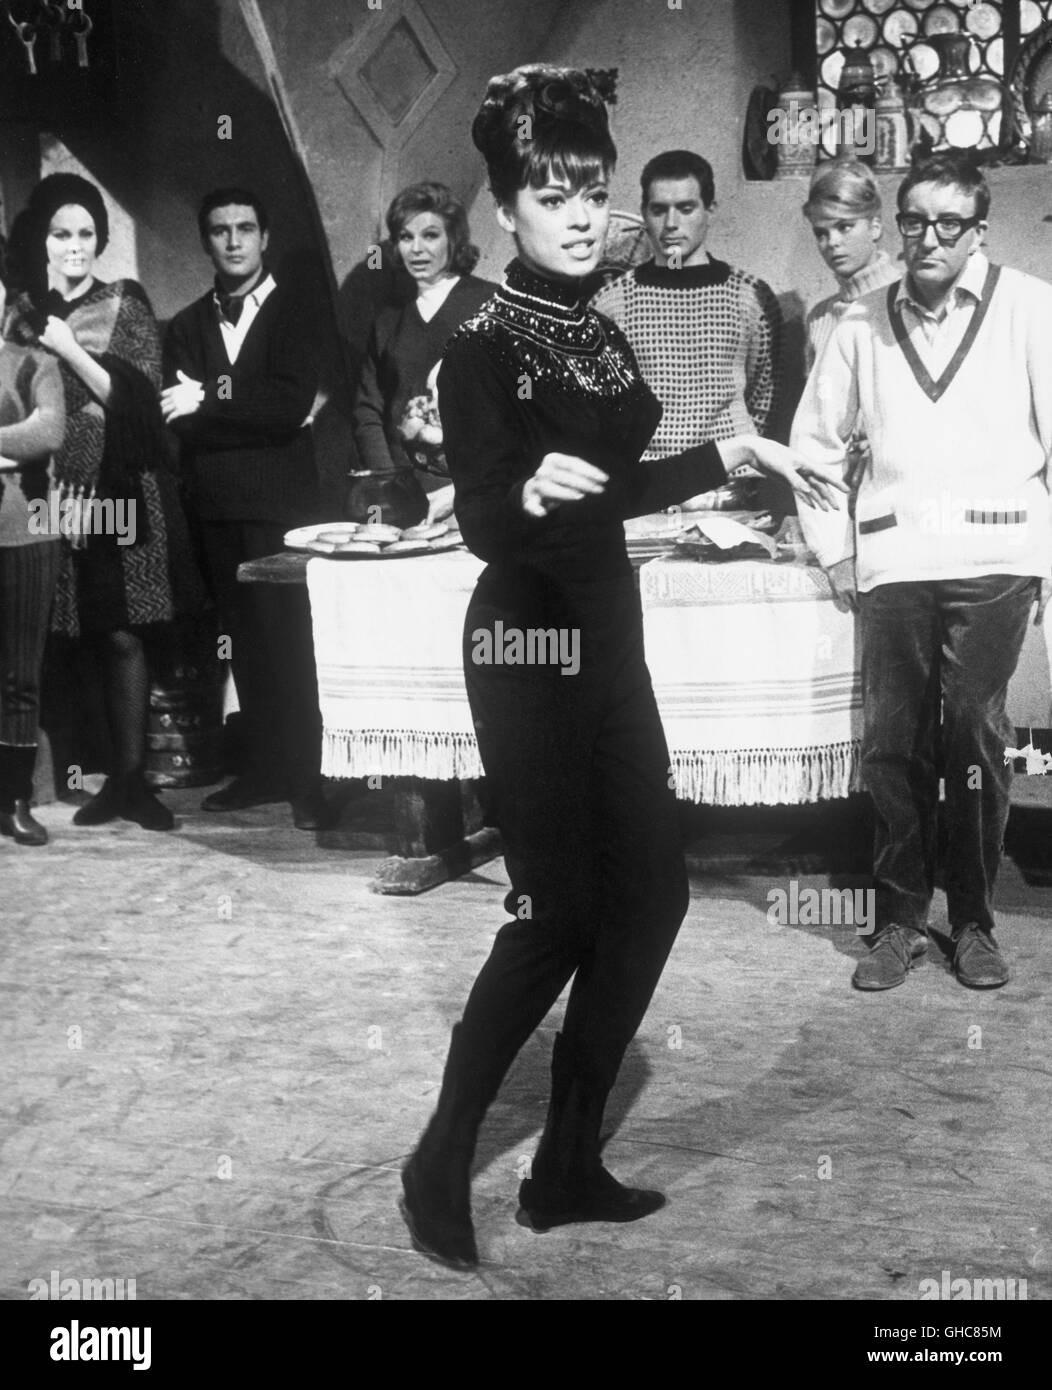 THE PINK PANTHER UK/USA 1963 Blake Edwards Scene with MERI WELLES, PETER SELLERS (right) Regie: Blake Edwards - Stock Image